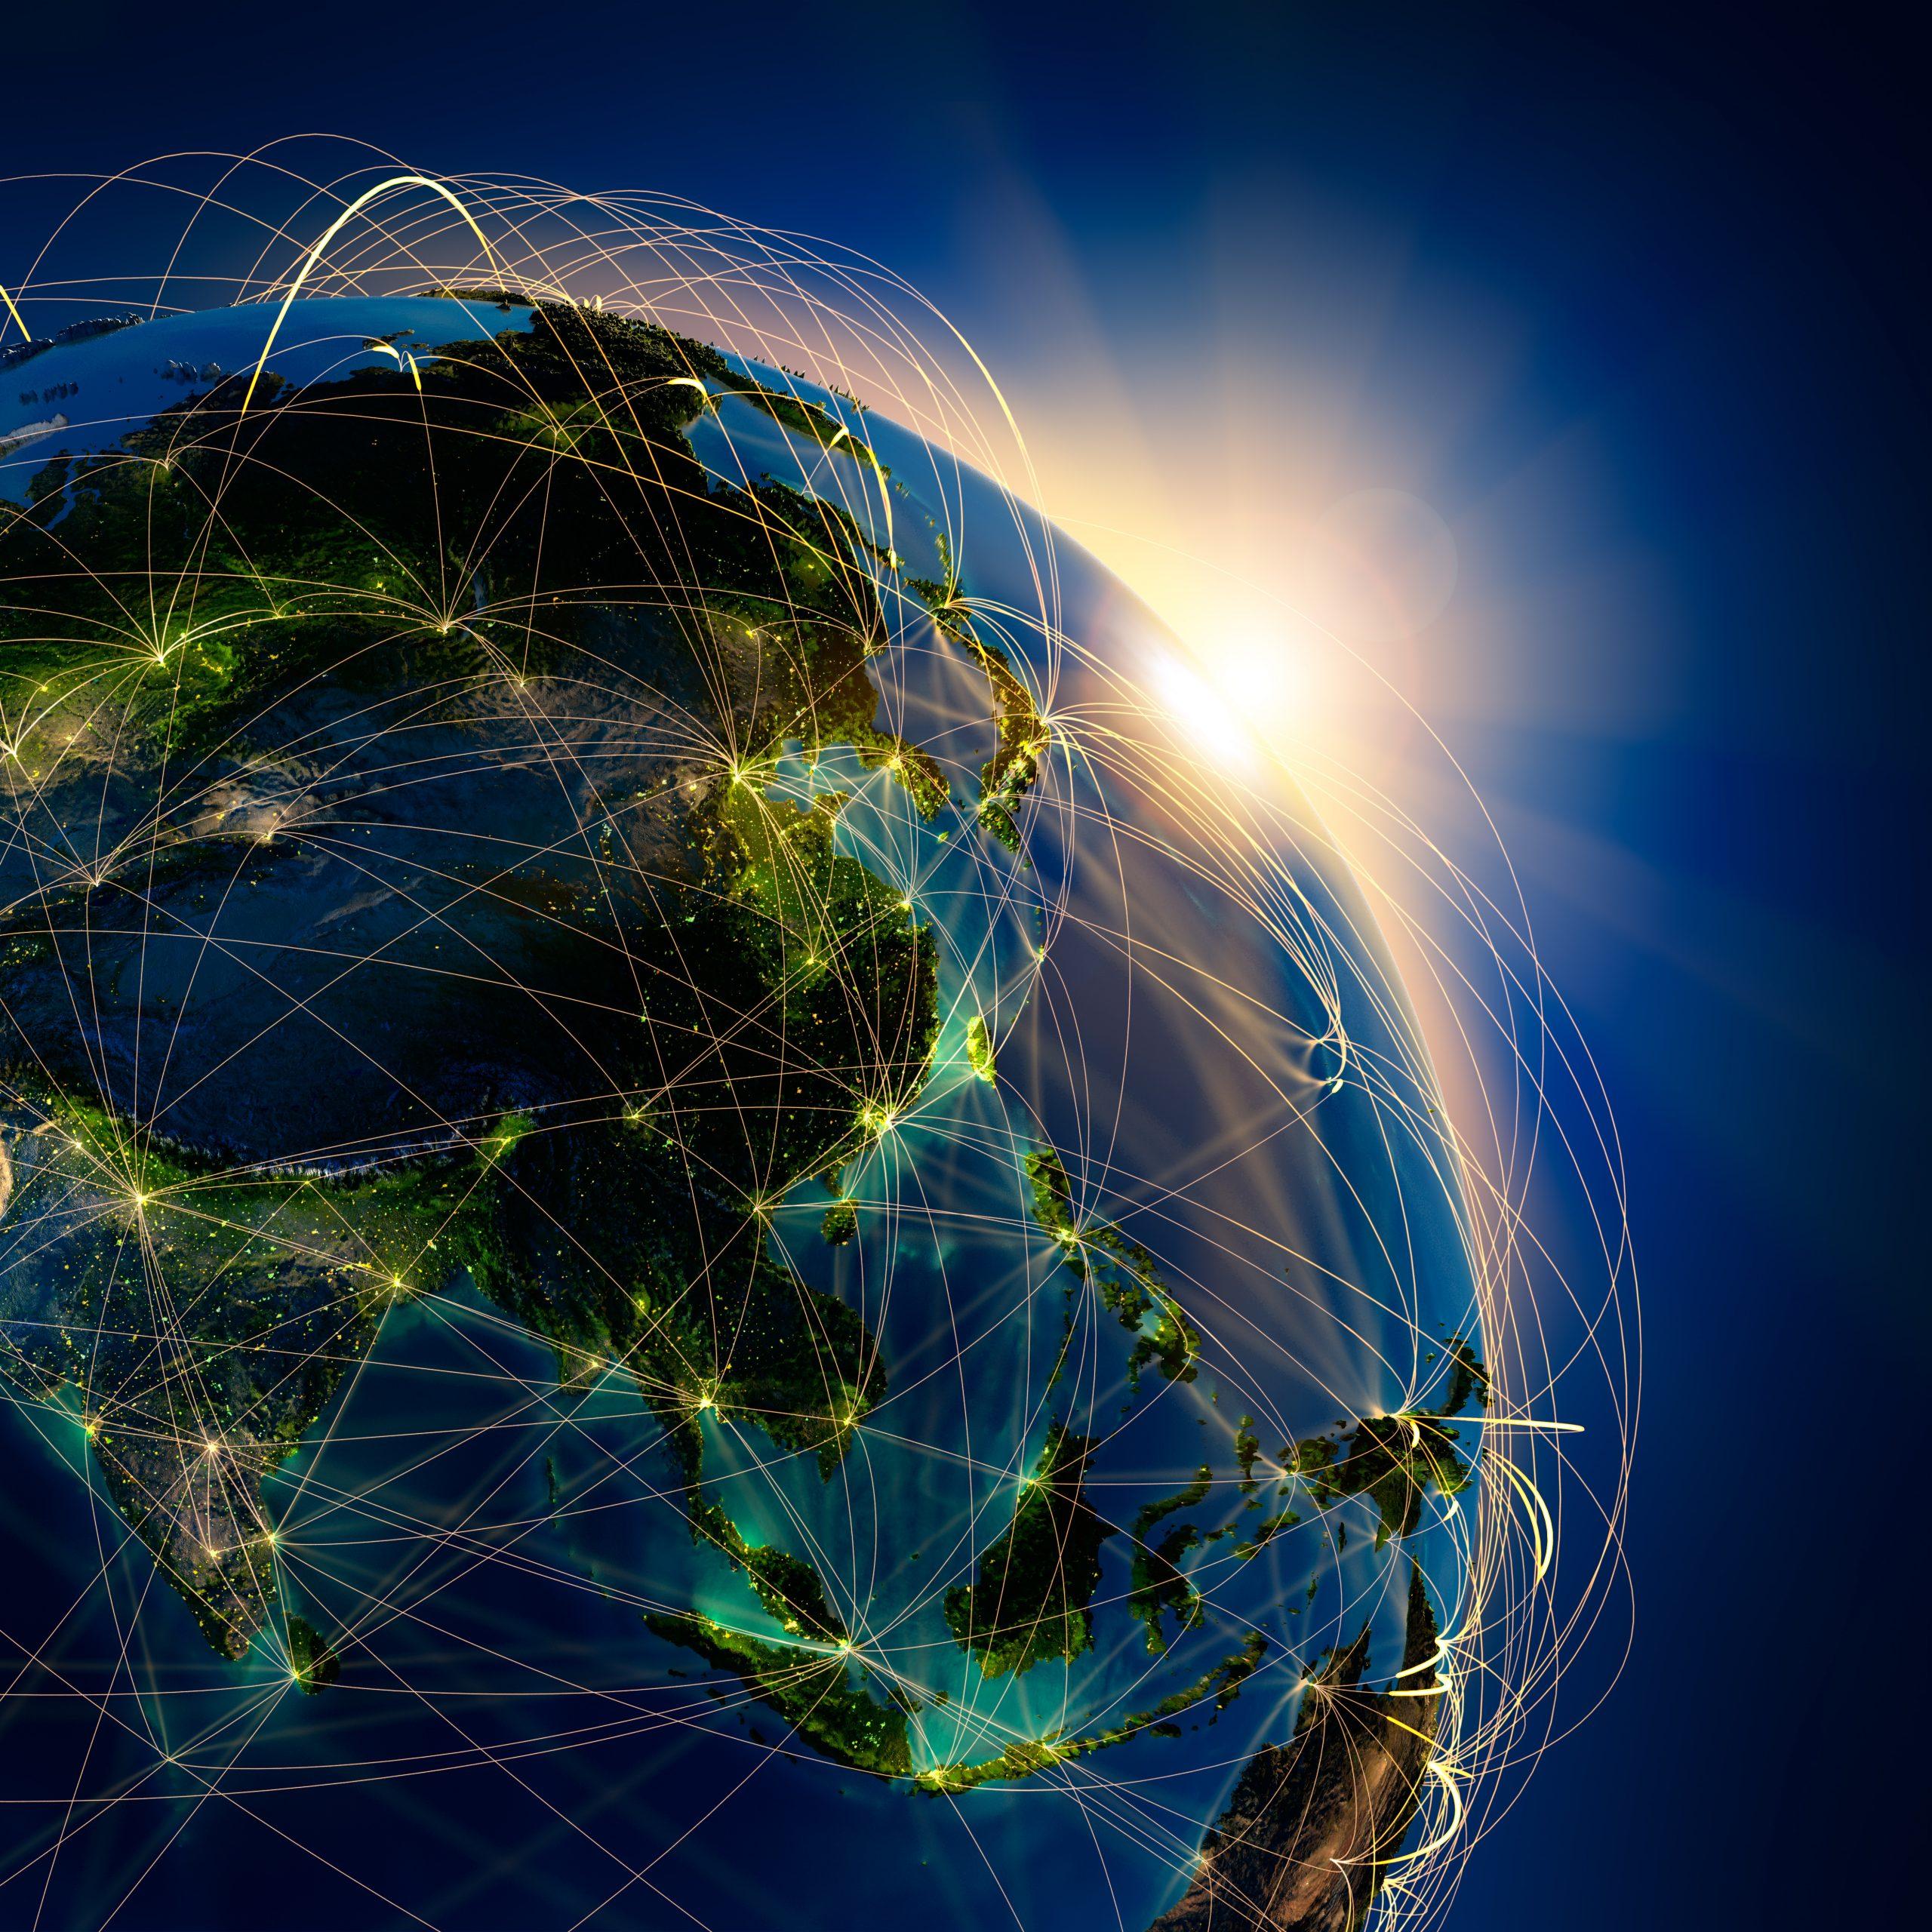 Globe satellite image